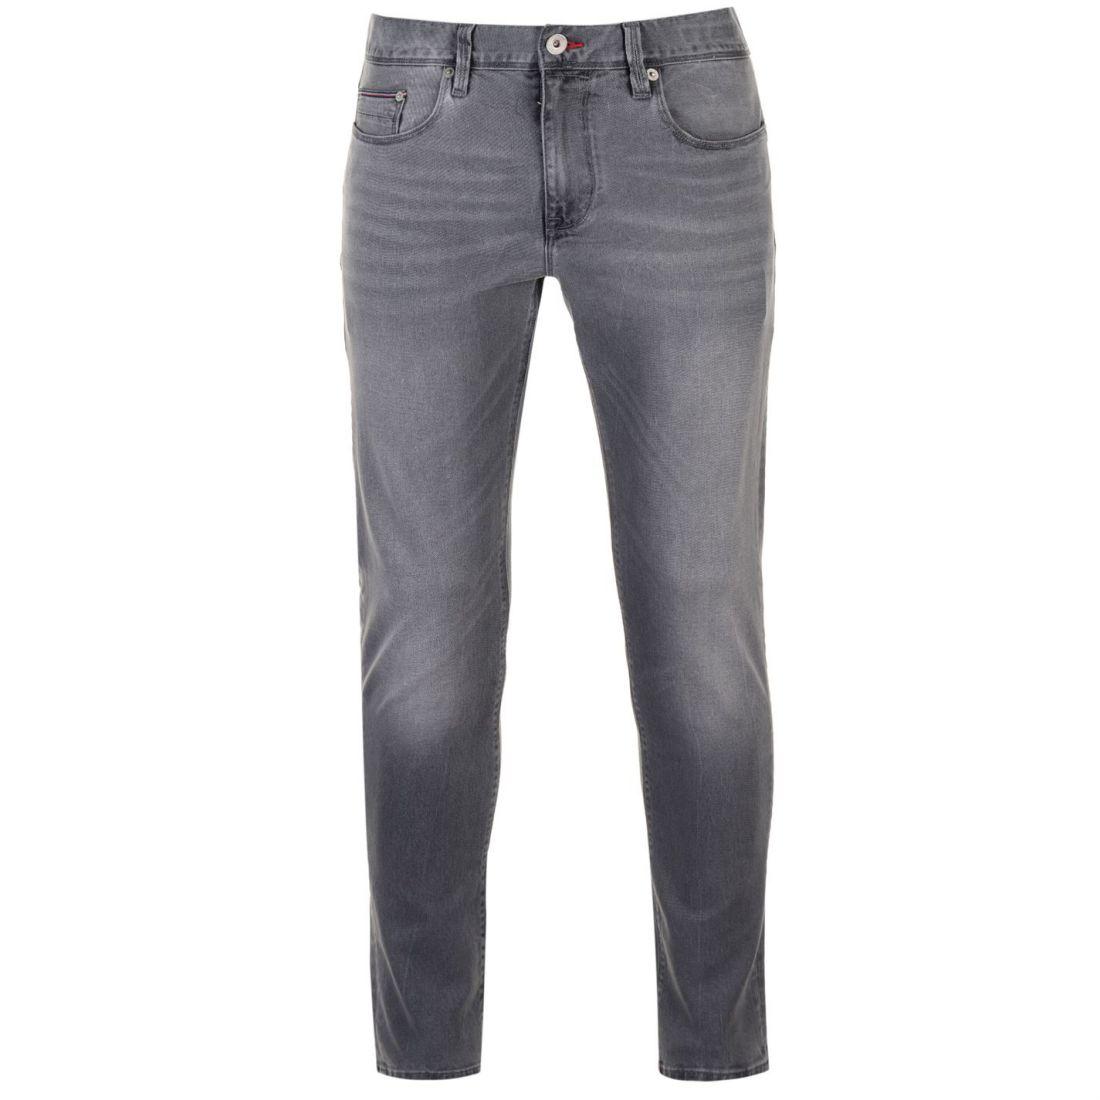 7b17a6a23 Mens Tommy Hilfiger Stretch Jeans Straight Zip New | eBay